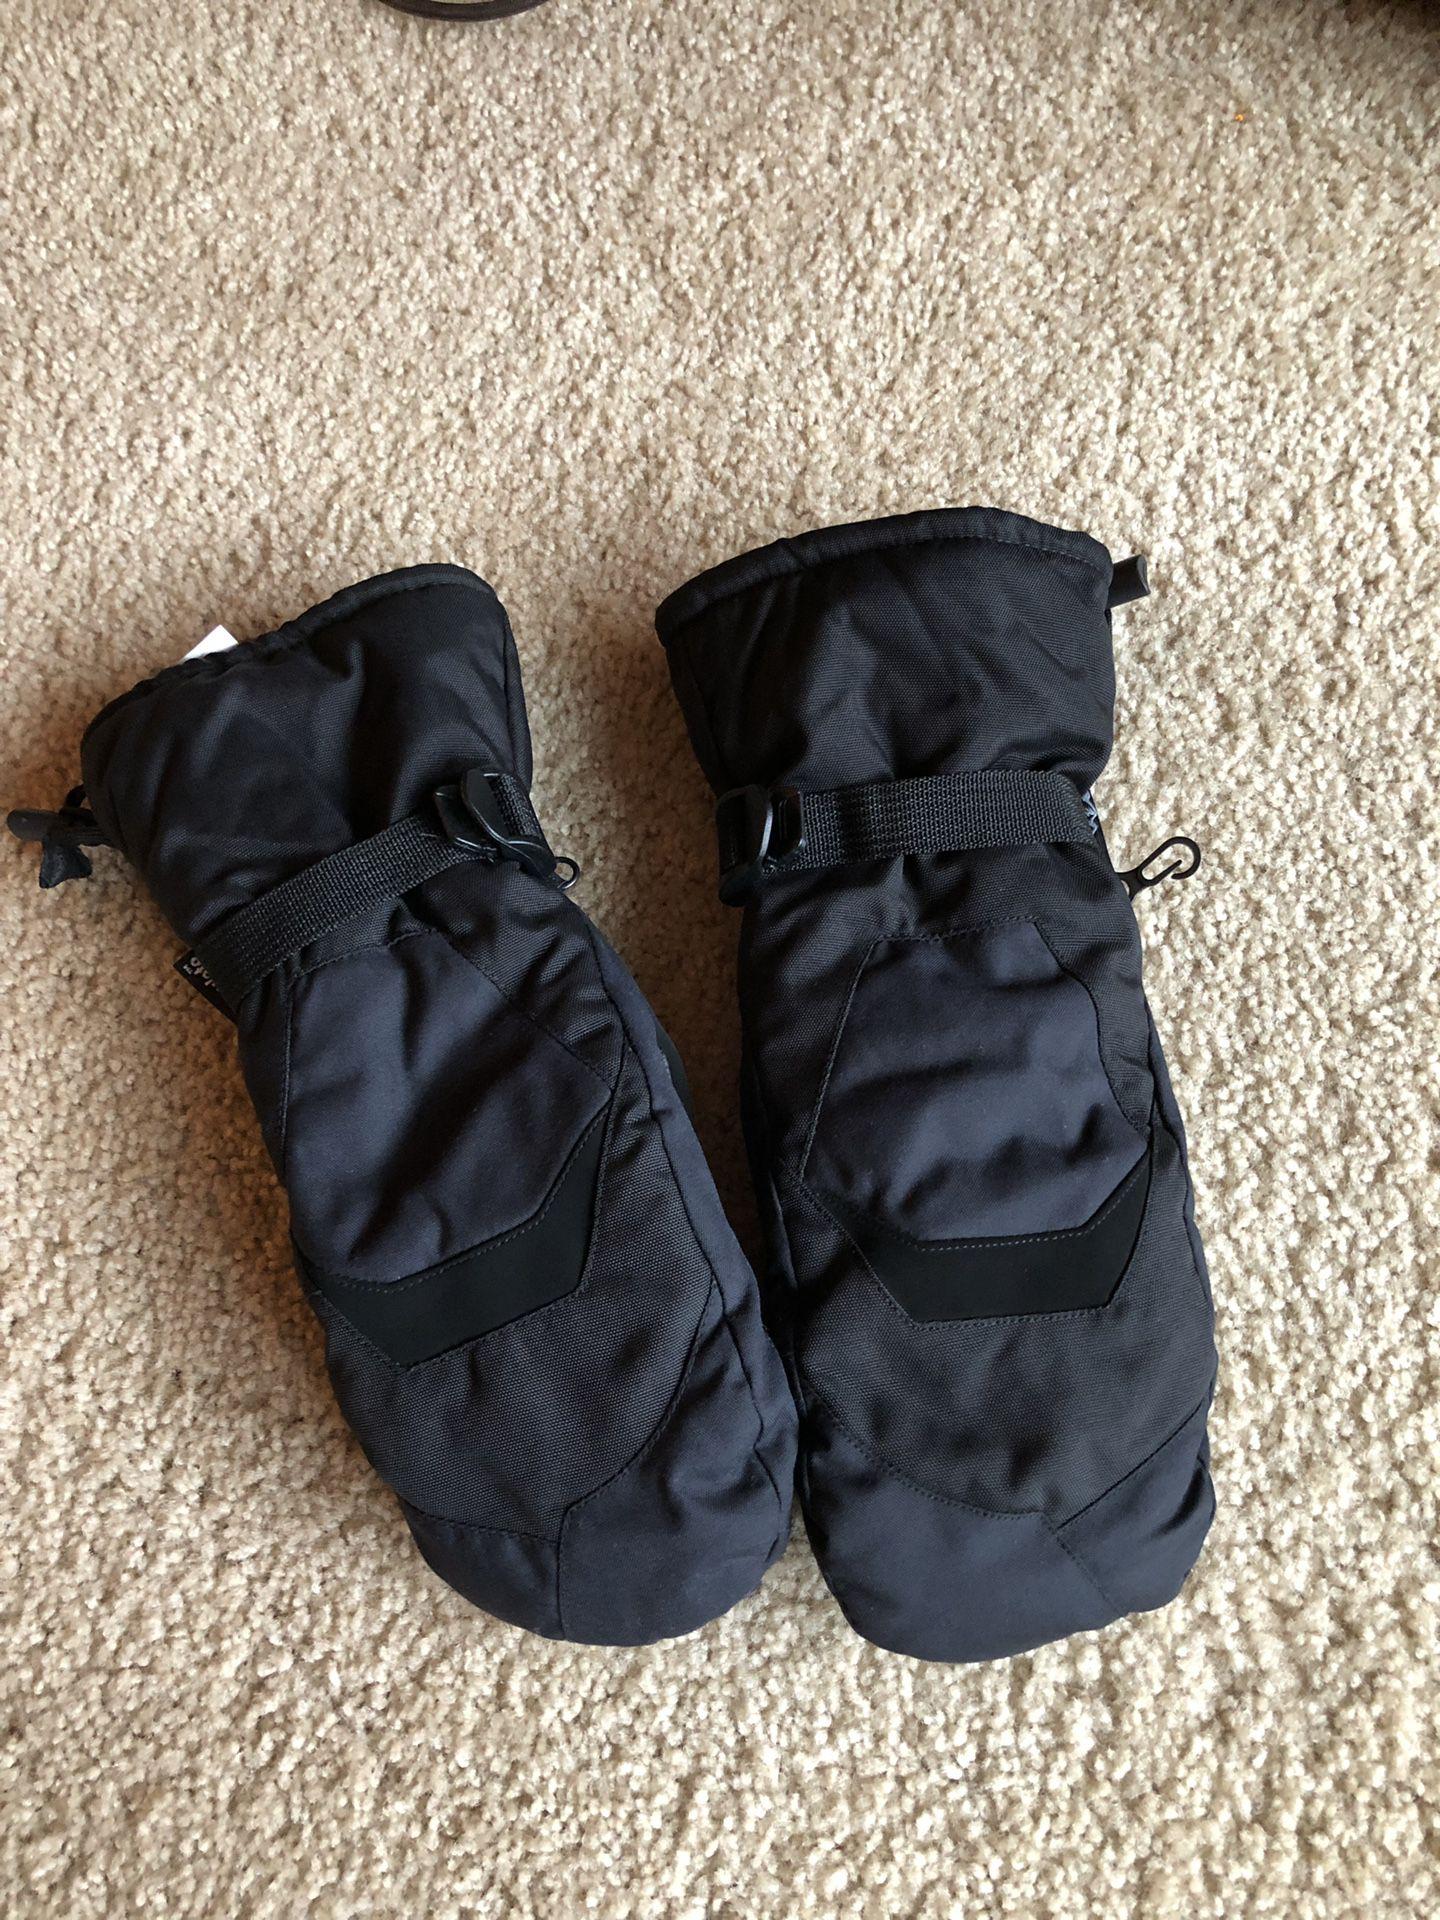 Snow mittens. Large.